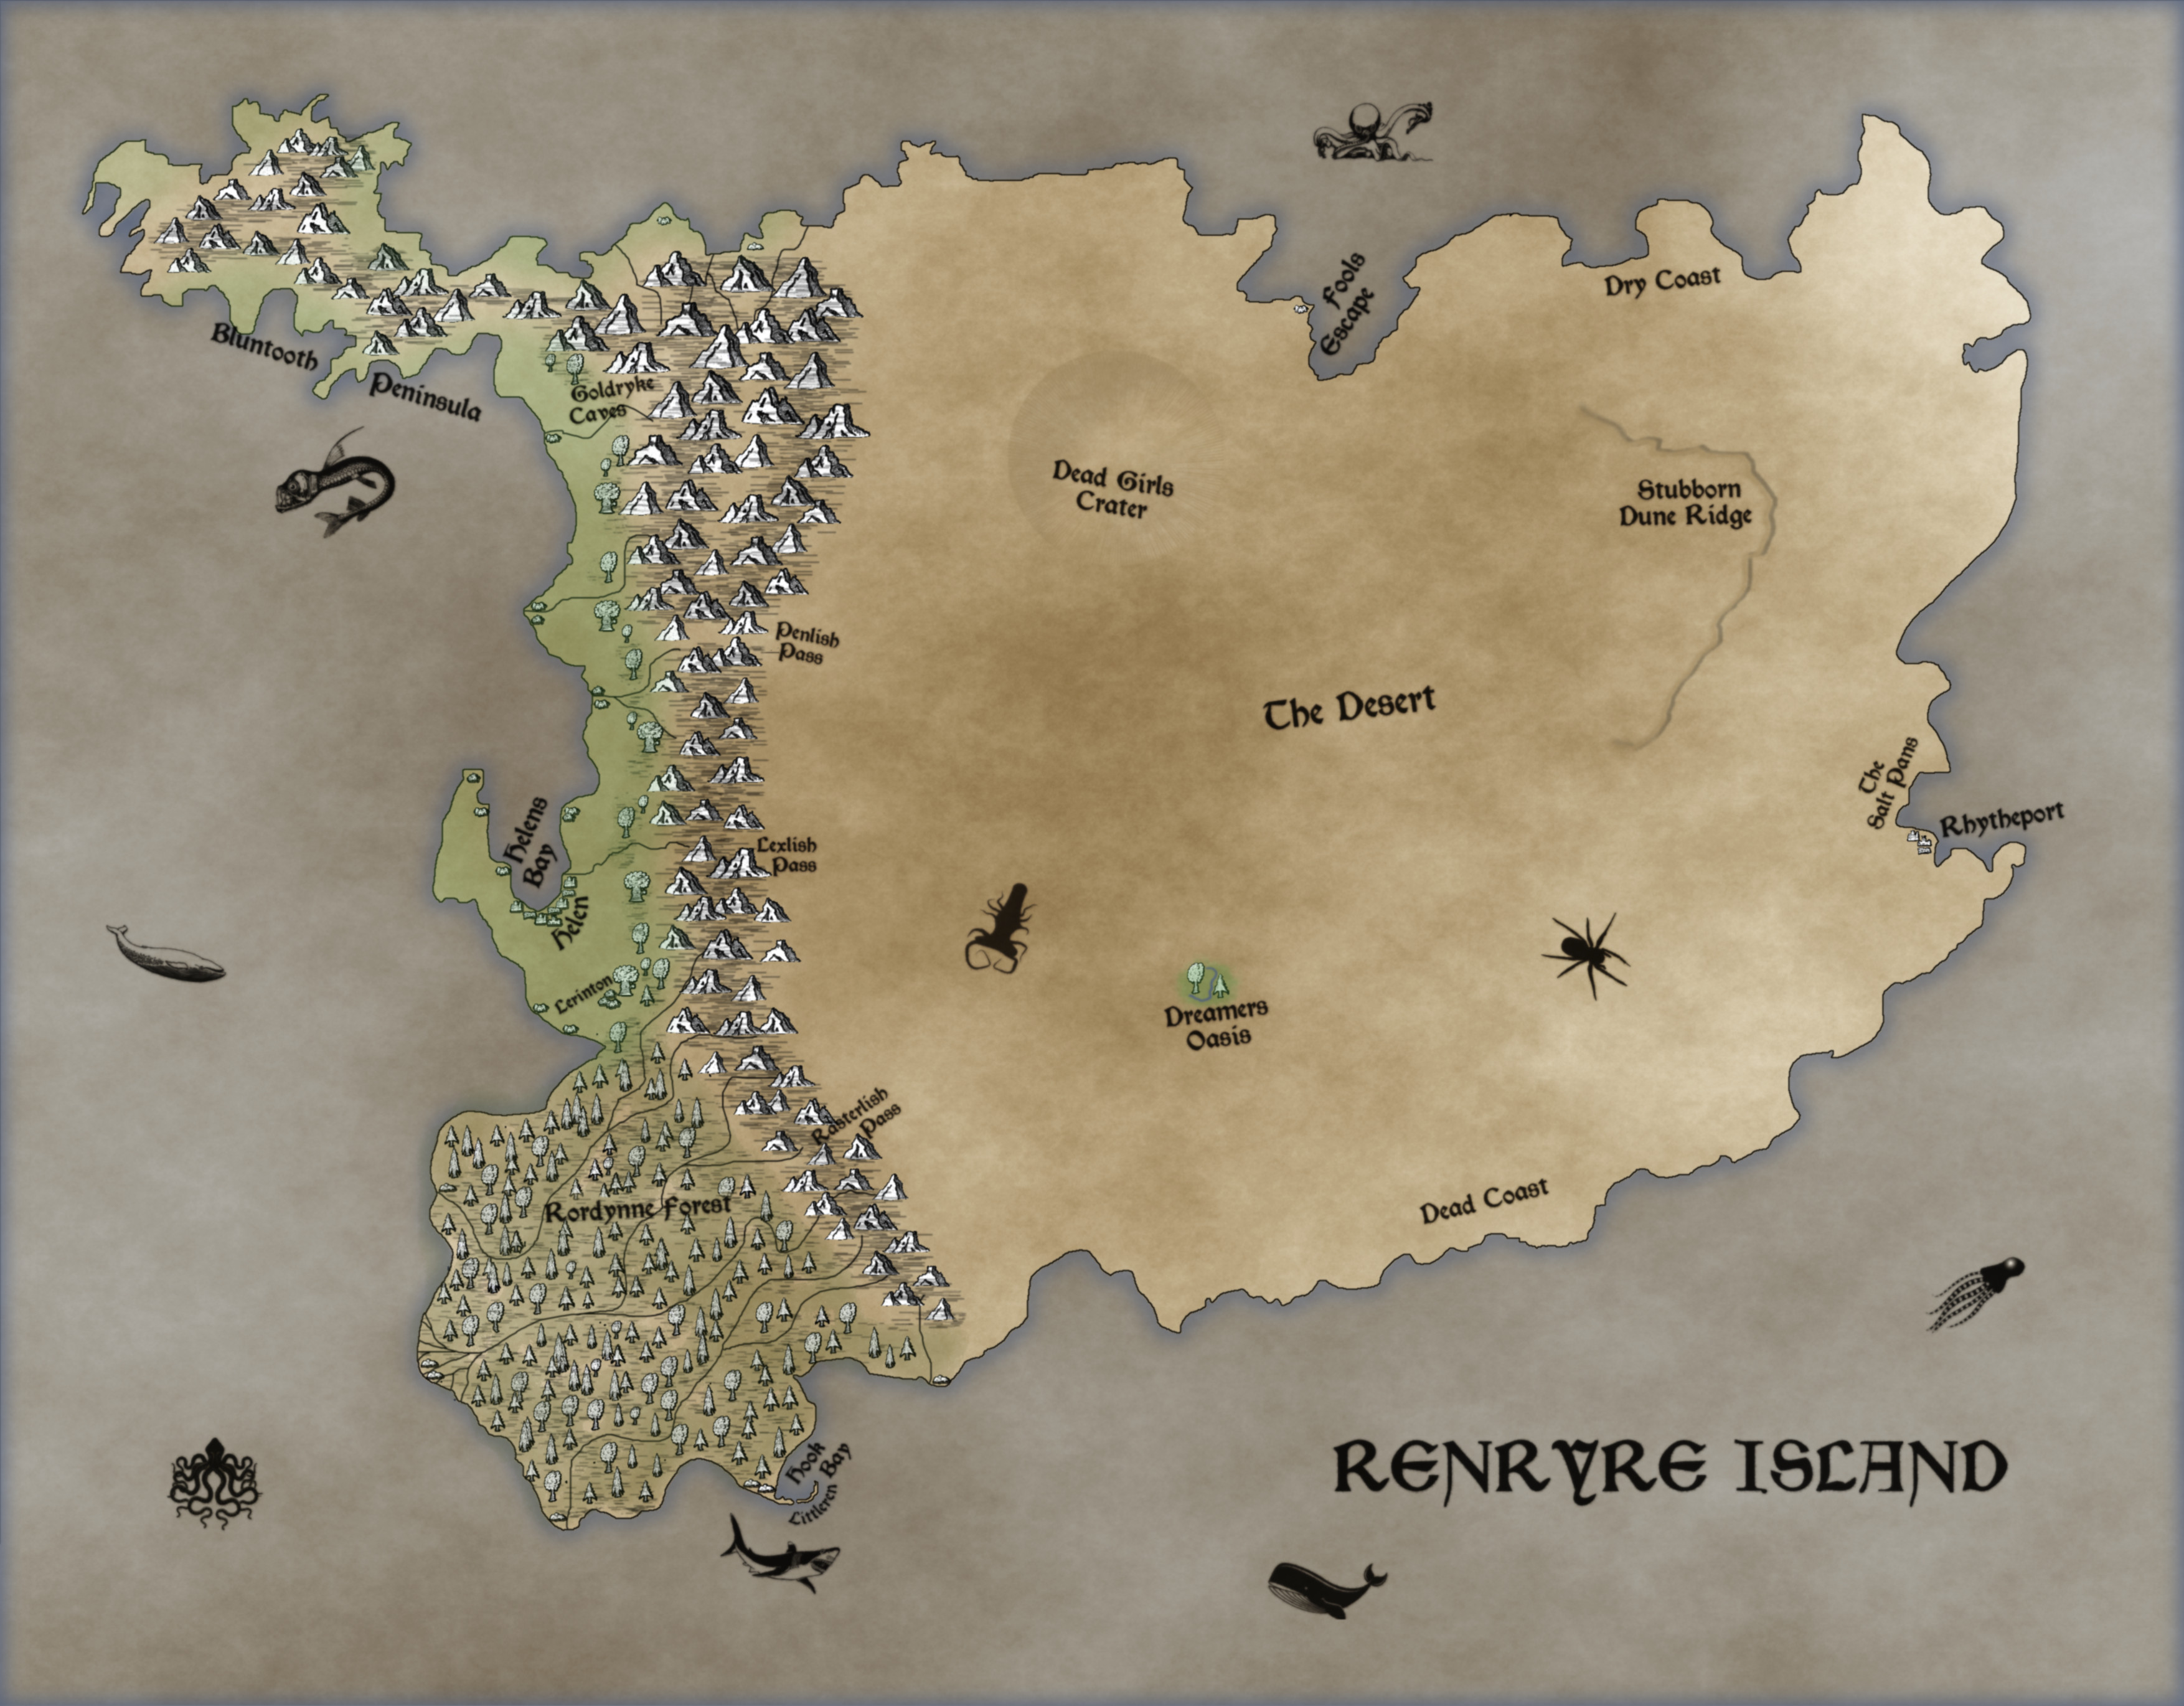 renryre_island_09_3508